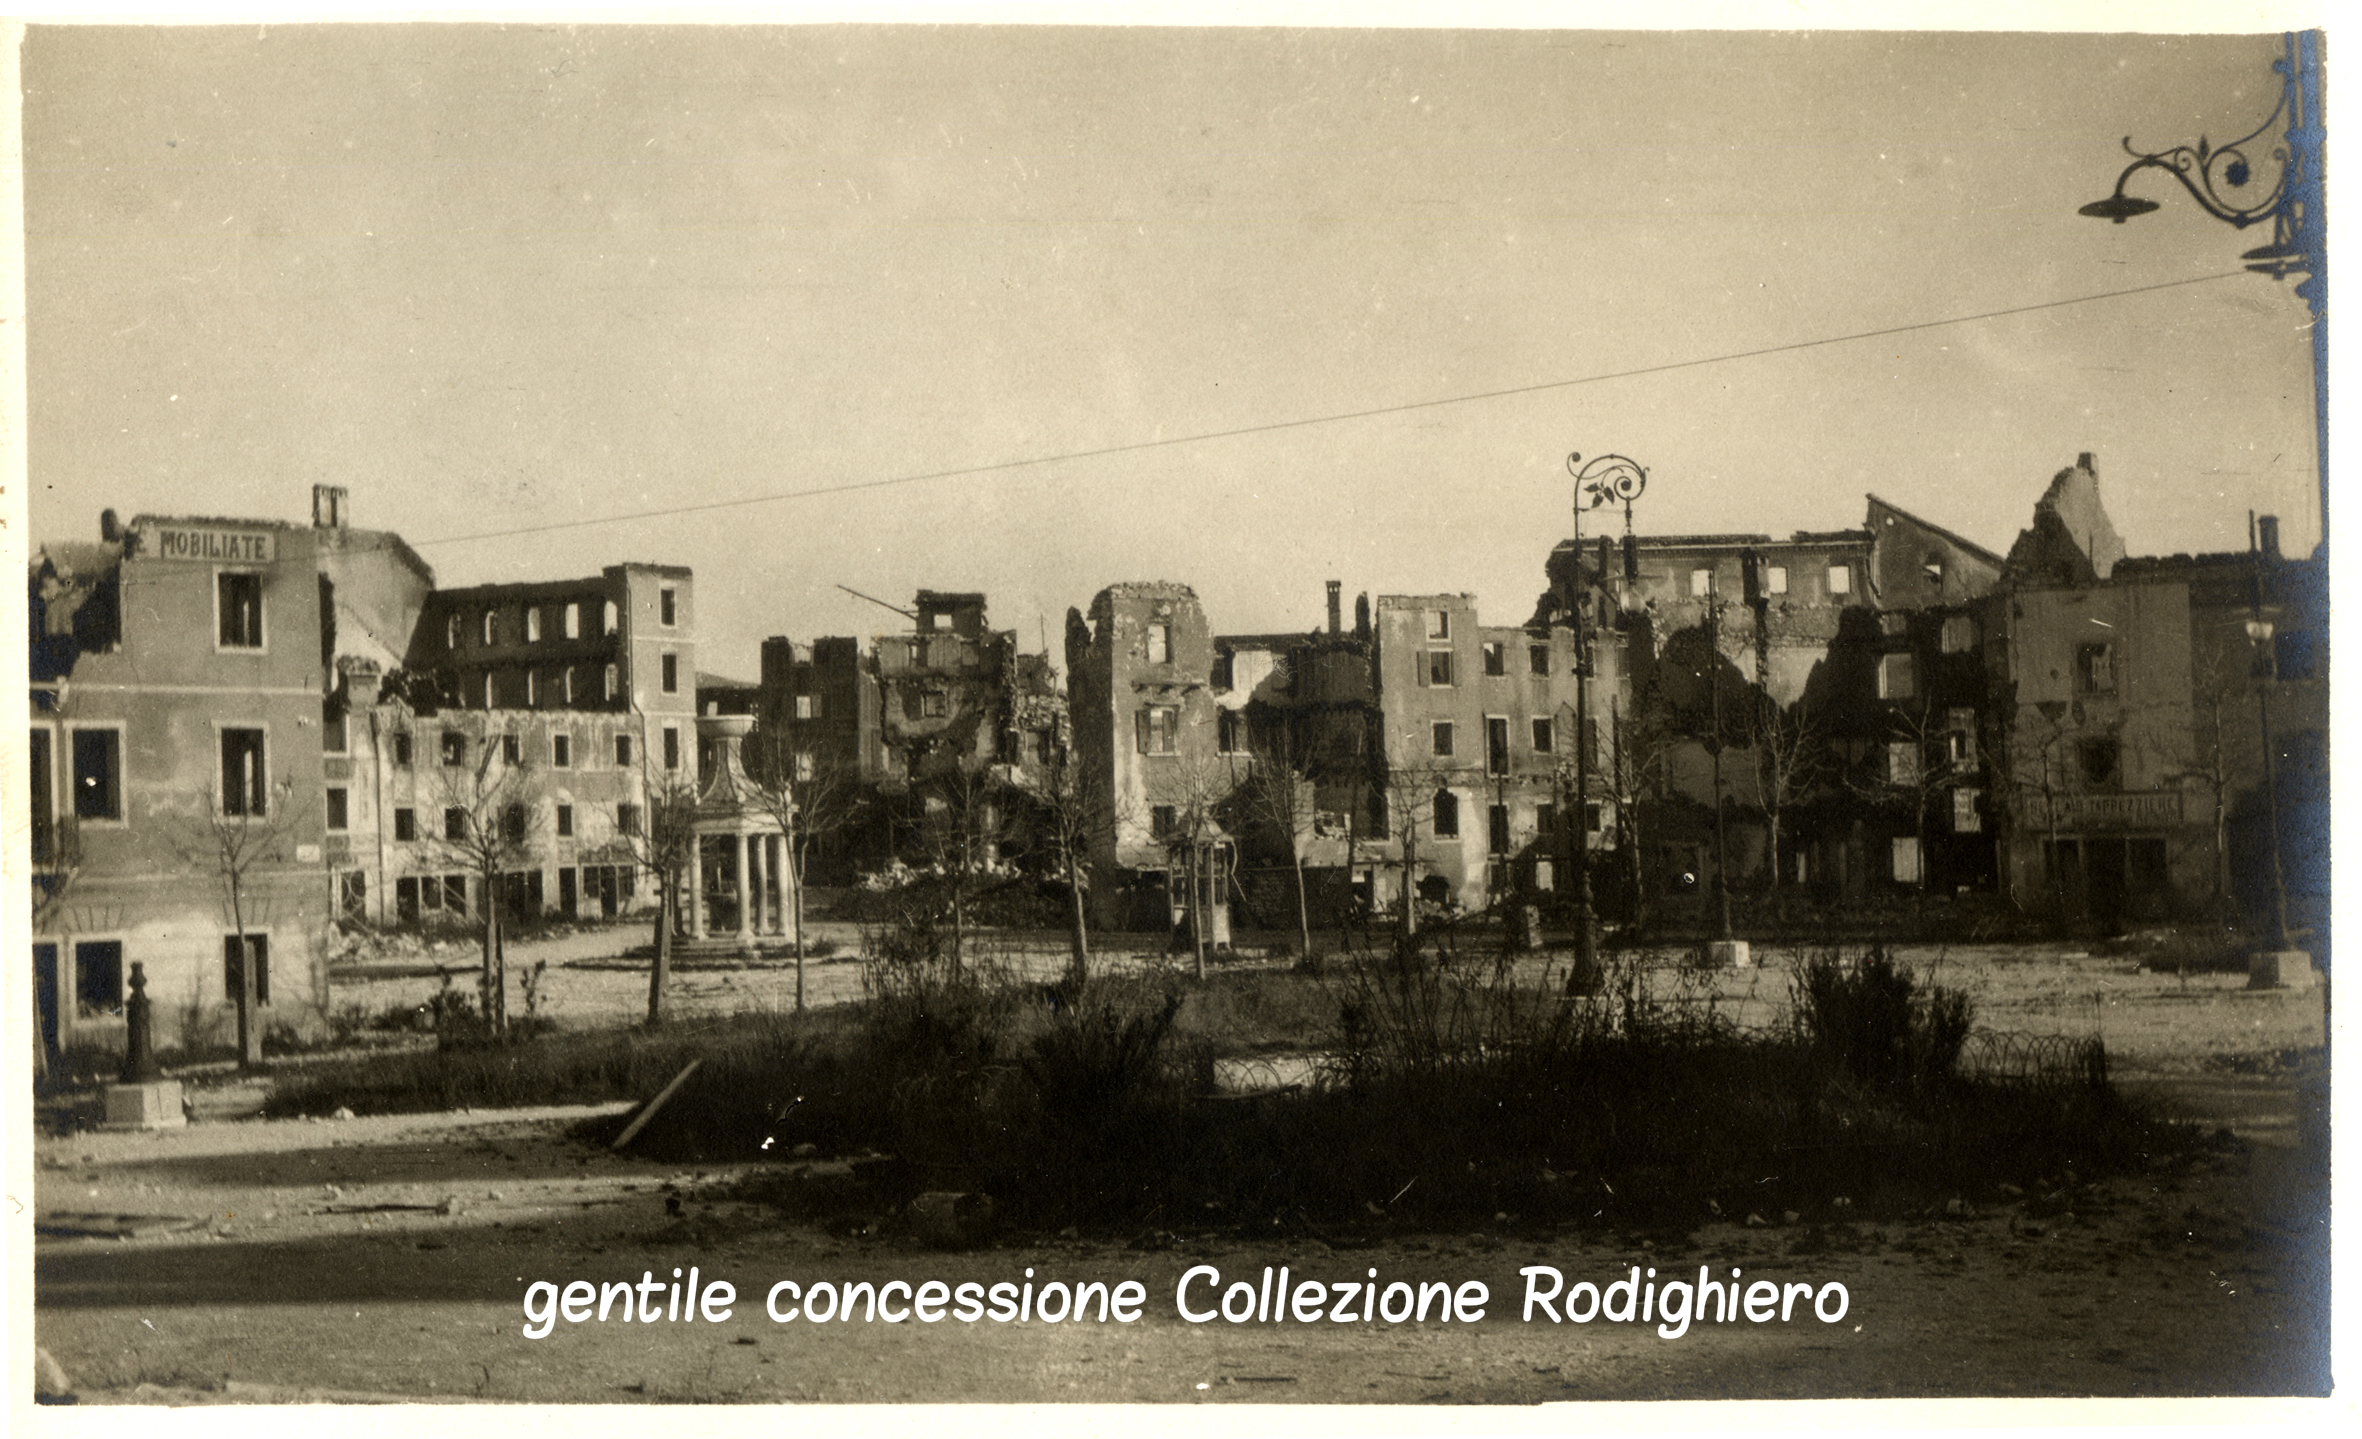 02 - rovine di Asiago - (ASDM- coll rodighiero) (c).jpg